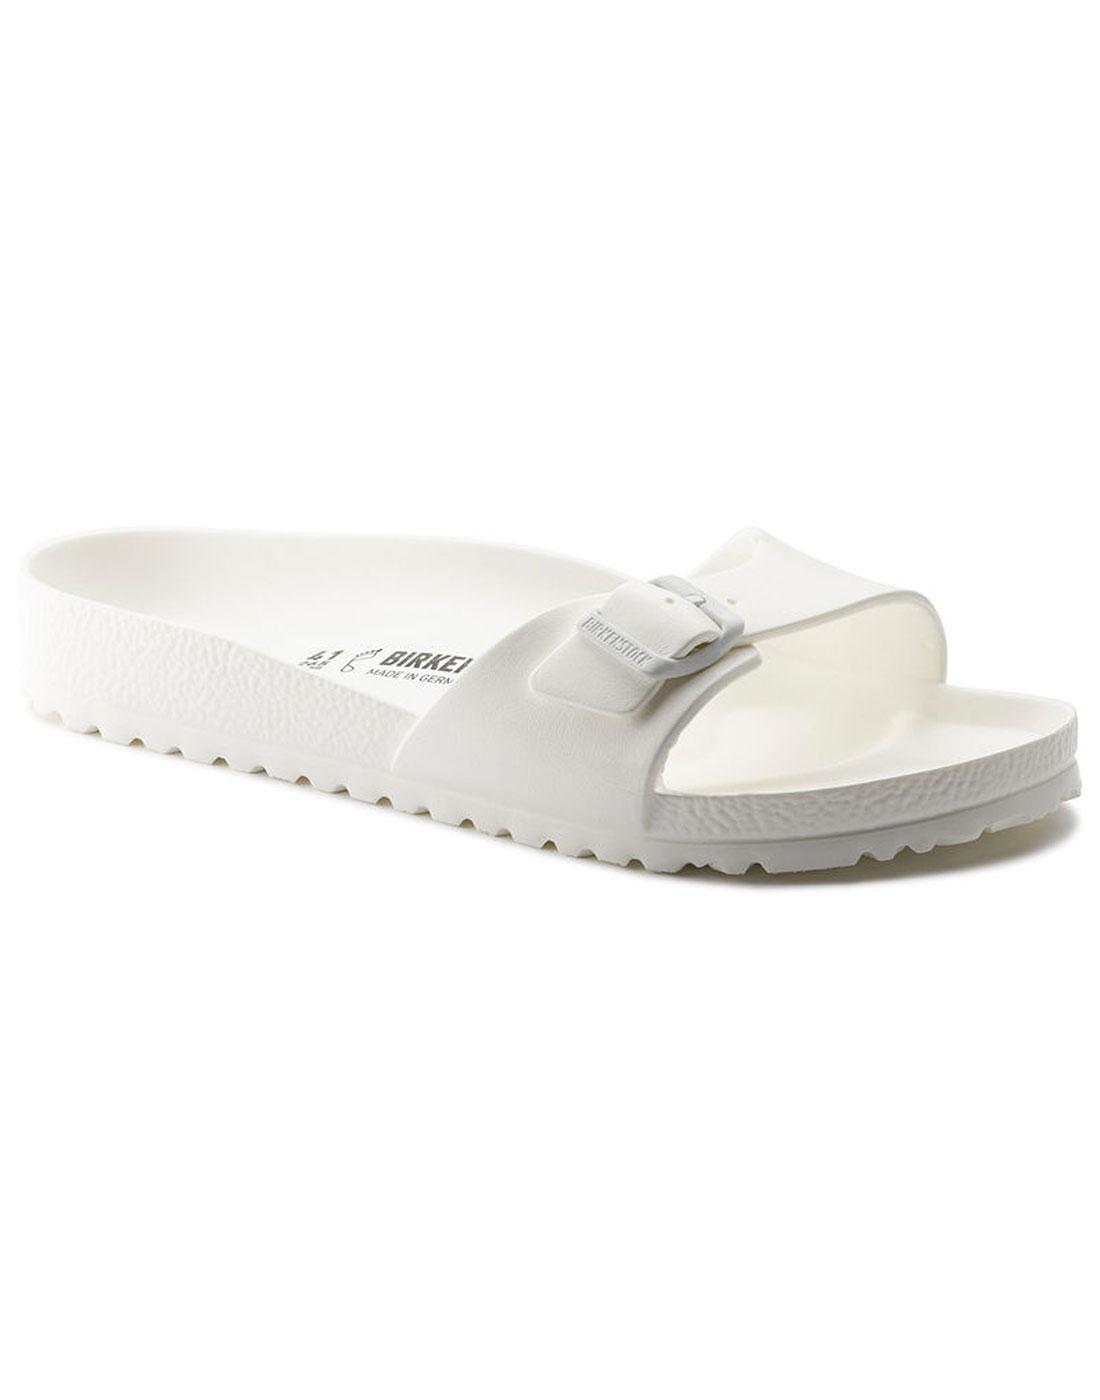 Madrid EVA BIRKENSTOCK Women's 1 Strap Sandals (W)